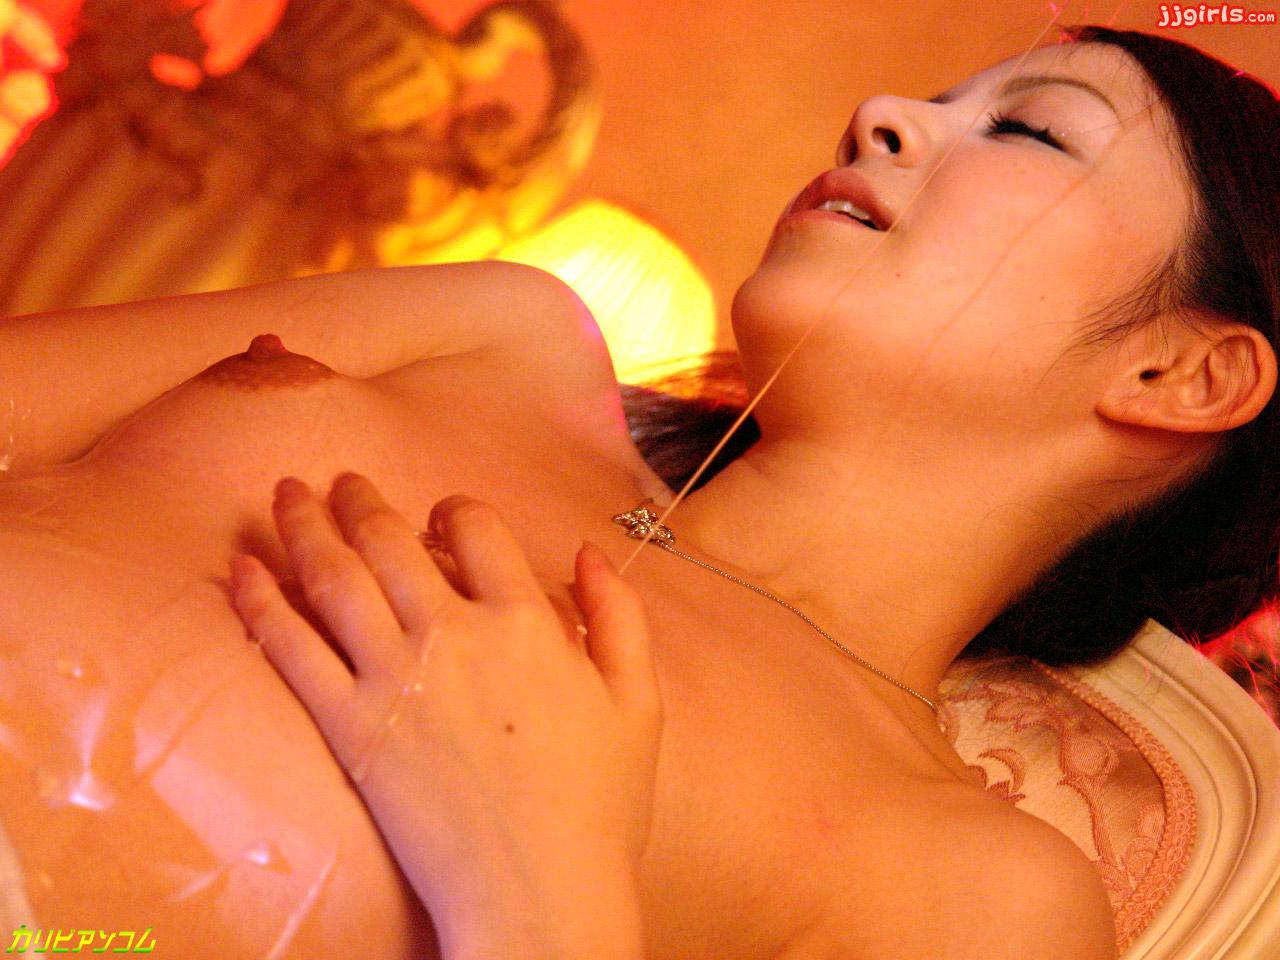 Charming rina koizumi bukkake video thanks for